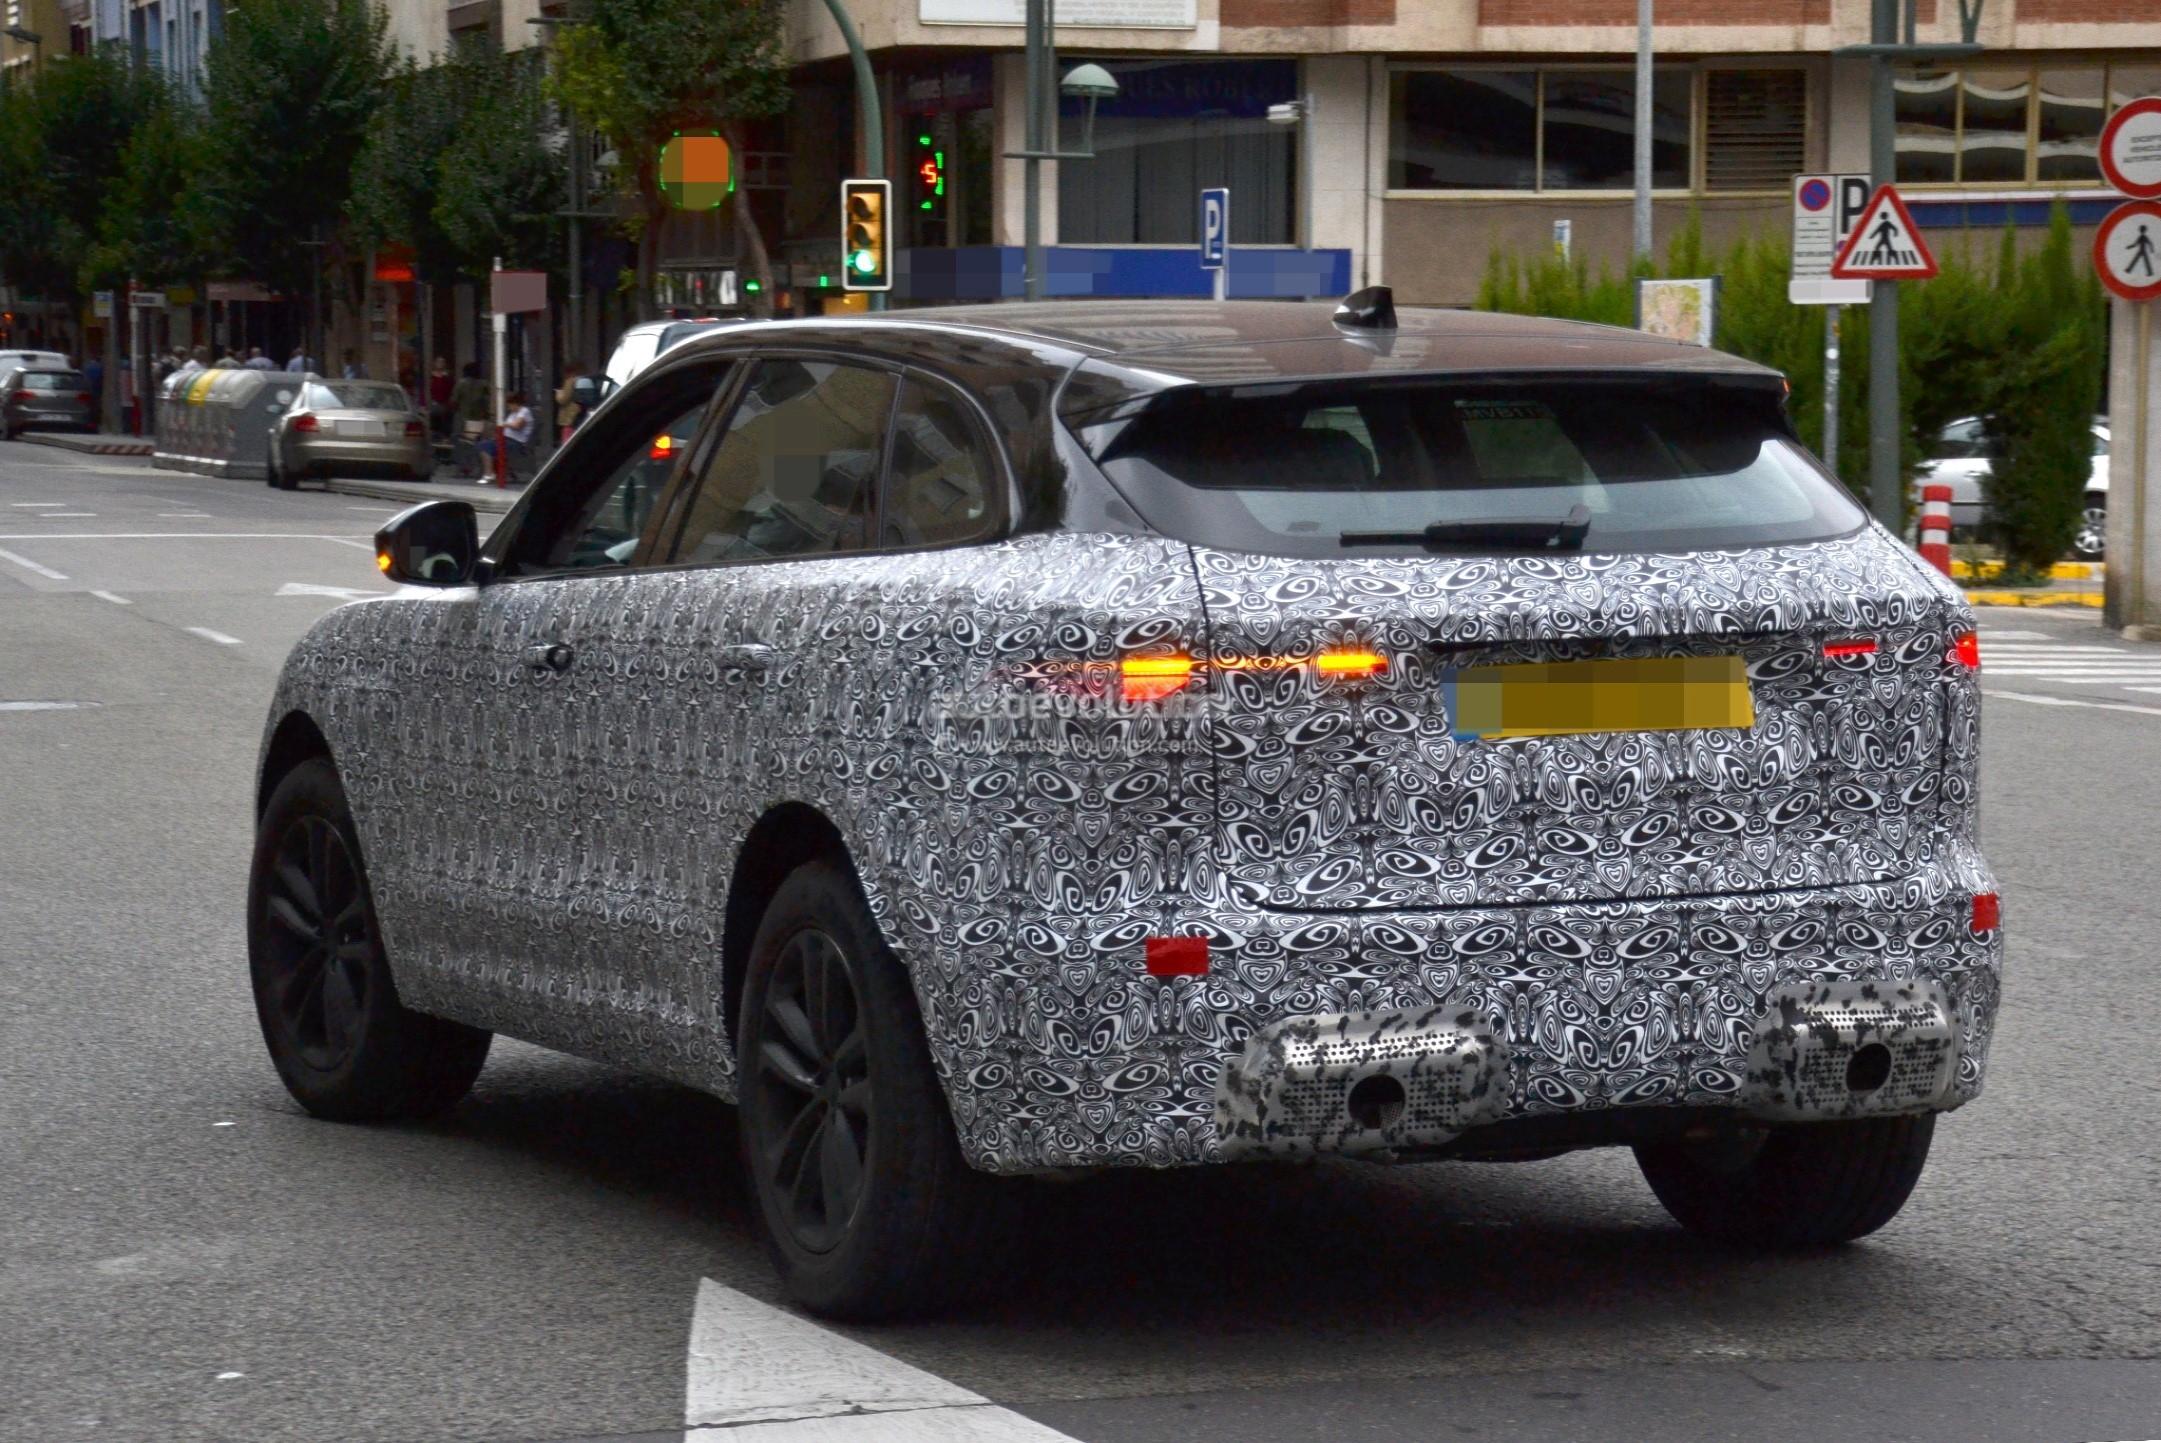 2021 Jaguar F-Pace Spied Testing In Spain, Looks More ...